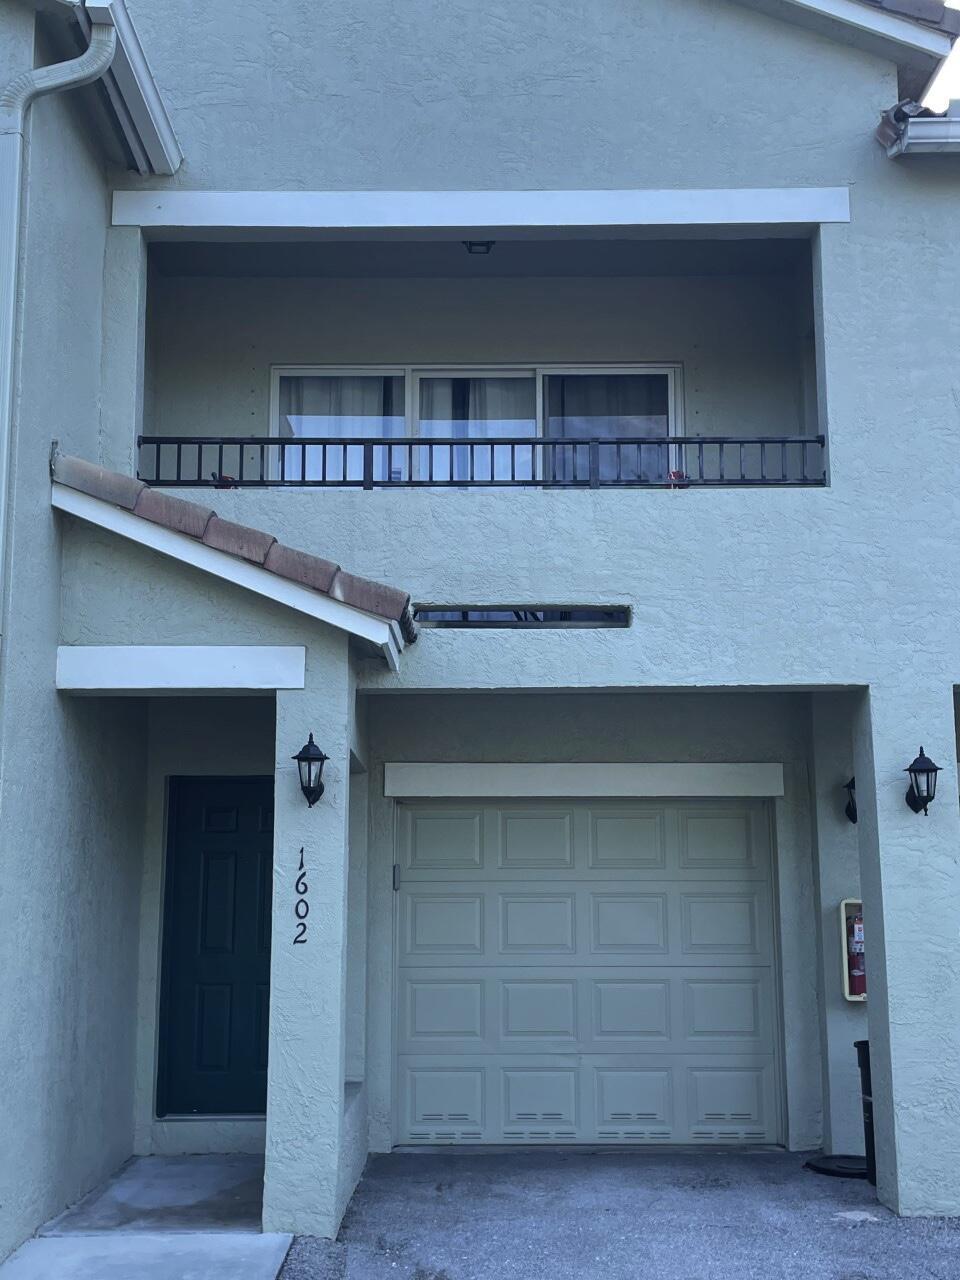 Details for 1602 Belmont Place 1602, Boynton Beach, FL 33436